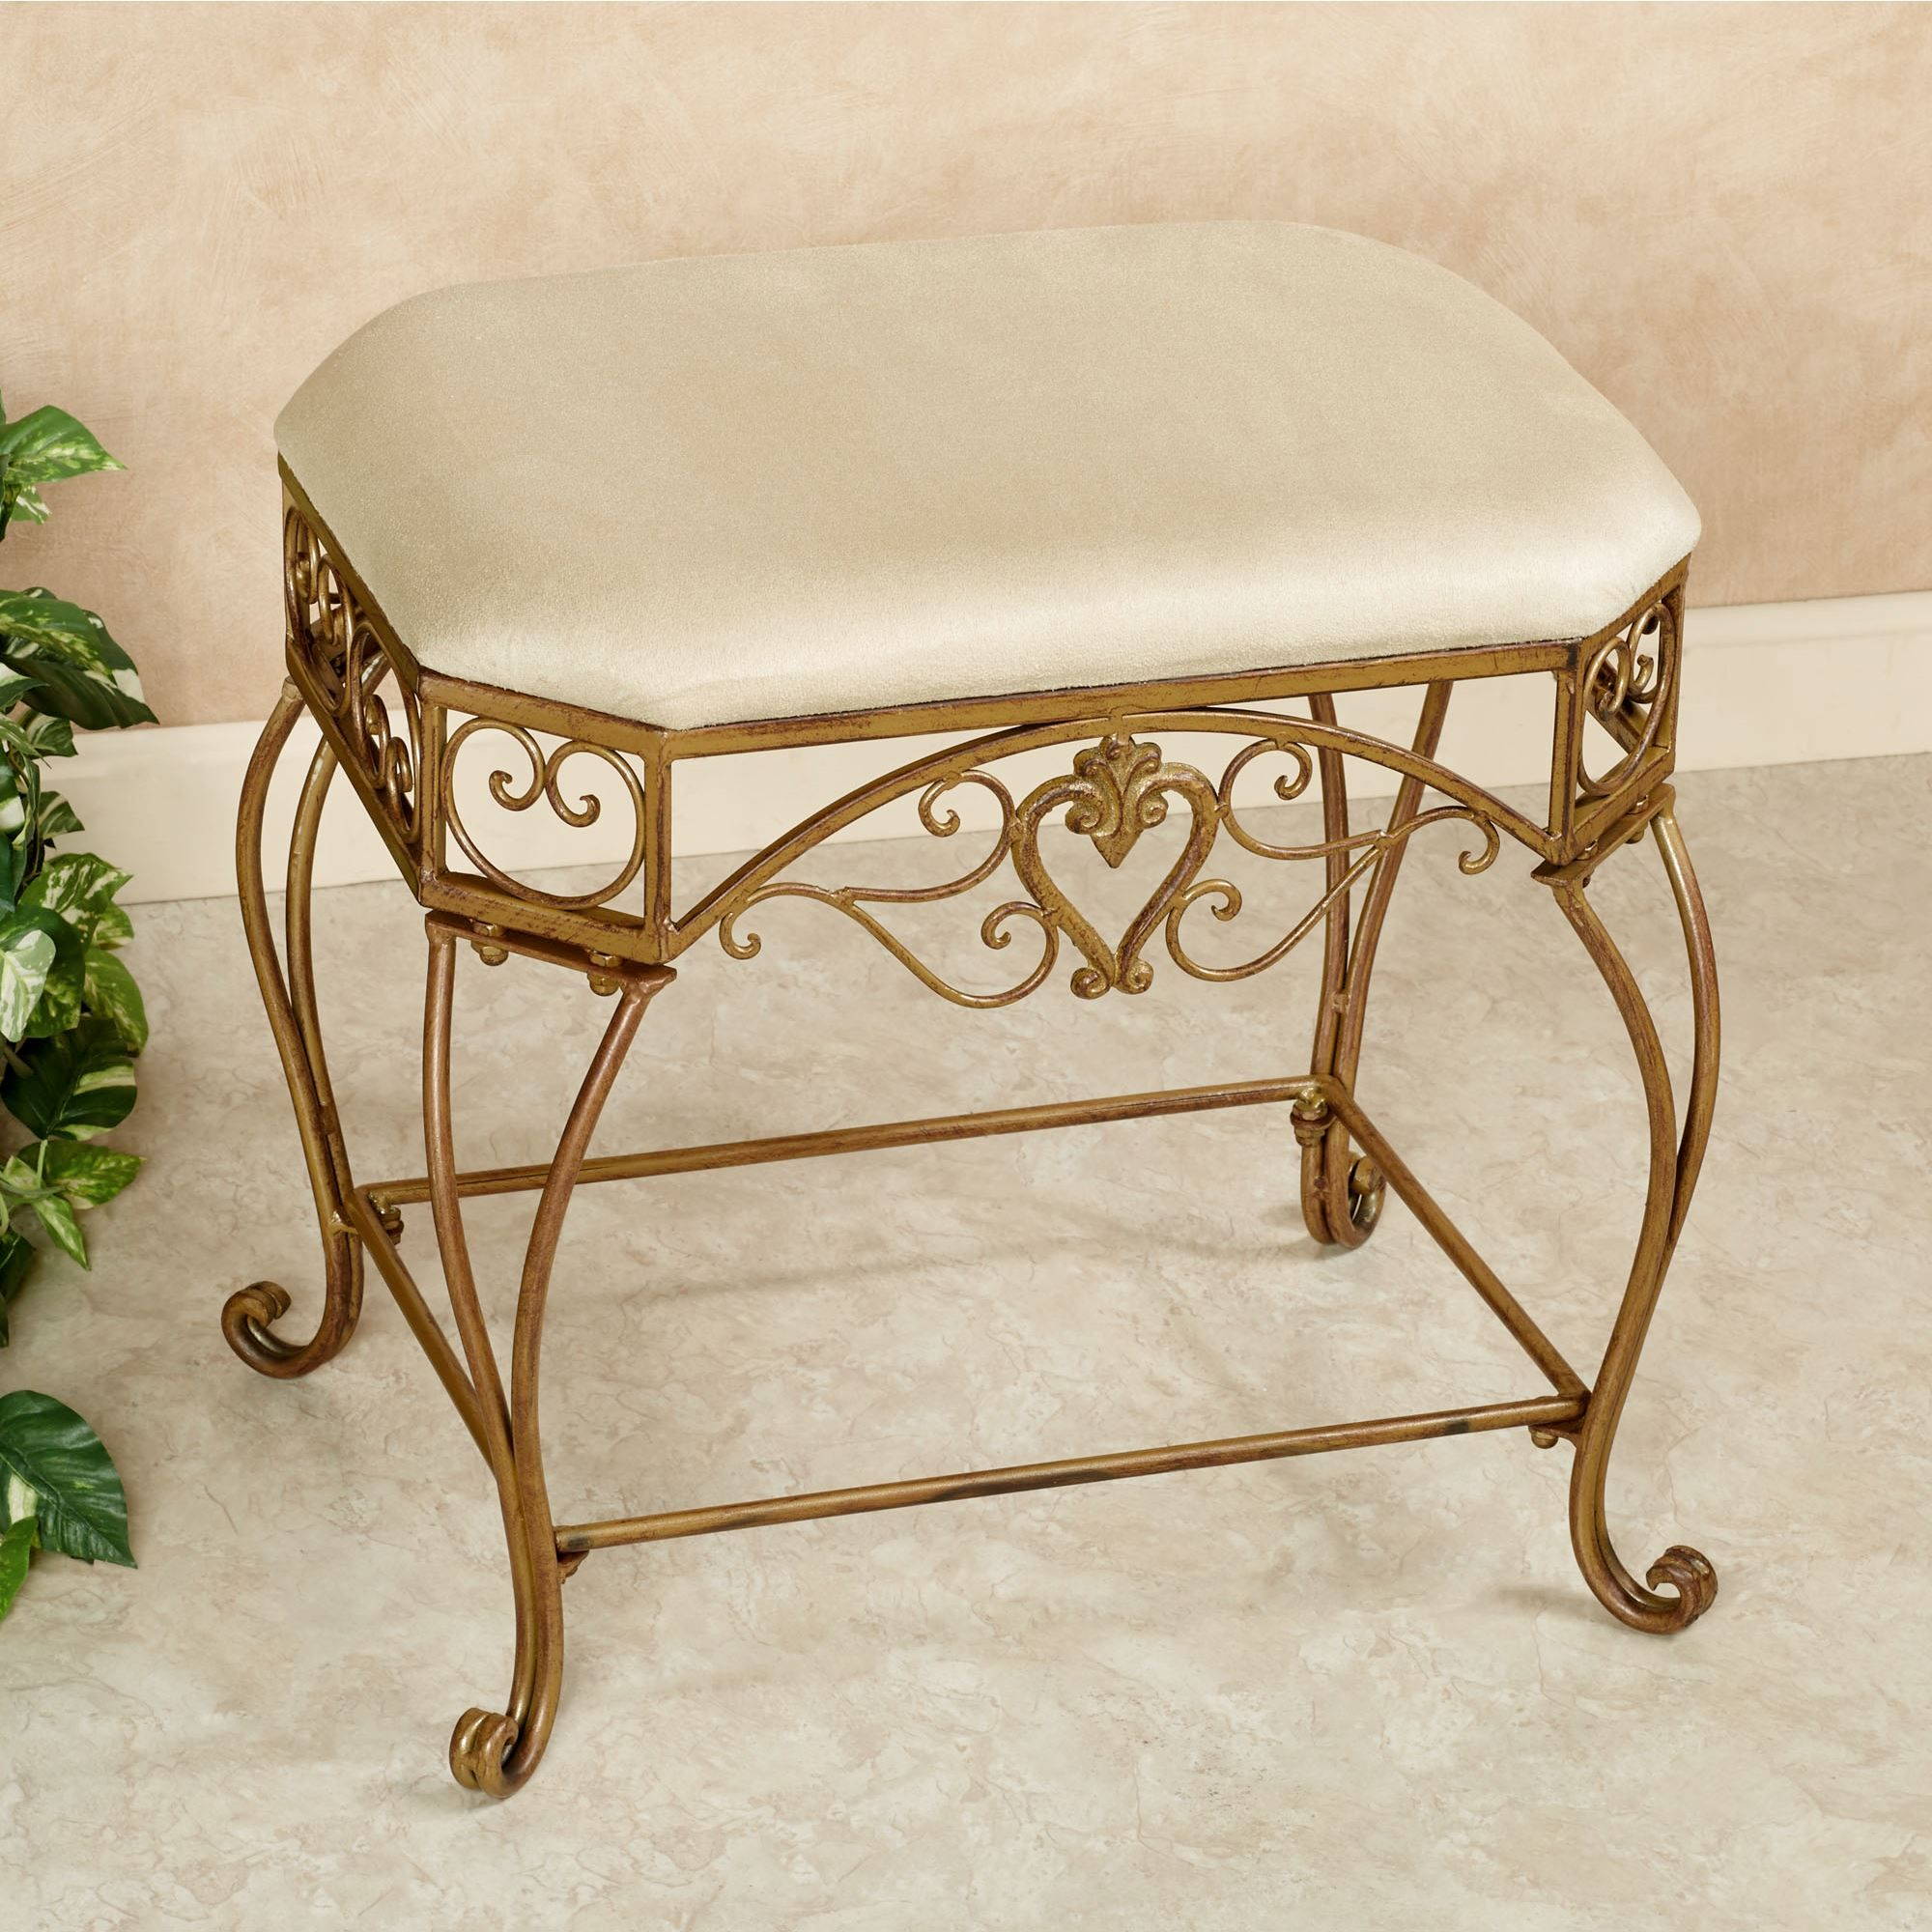 Aldabella Satin Gold Upholstered Vanity Bench Vanity Bench